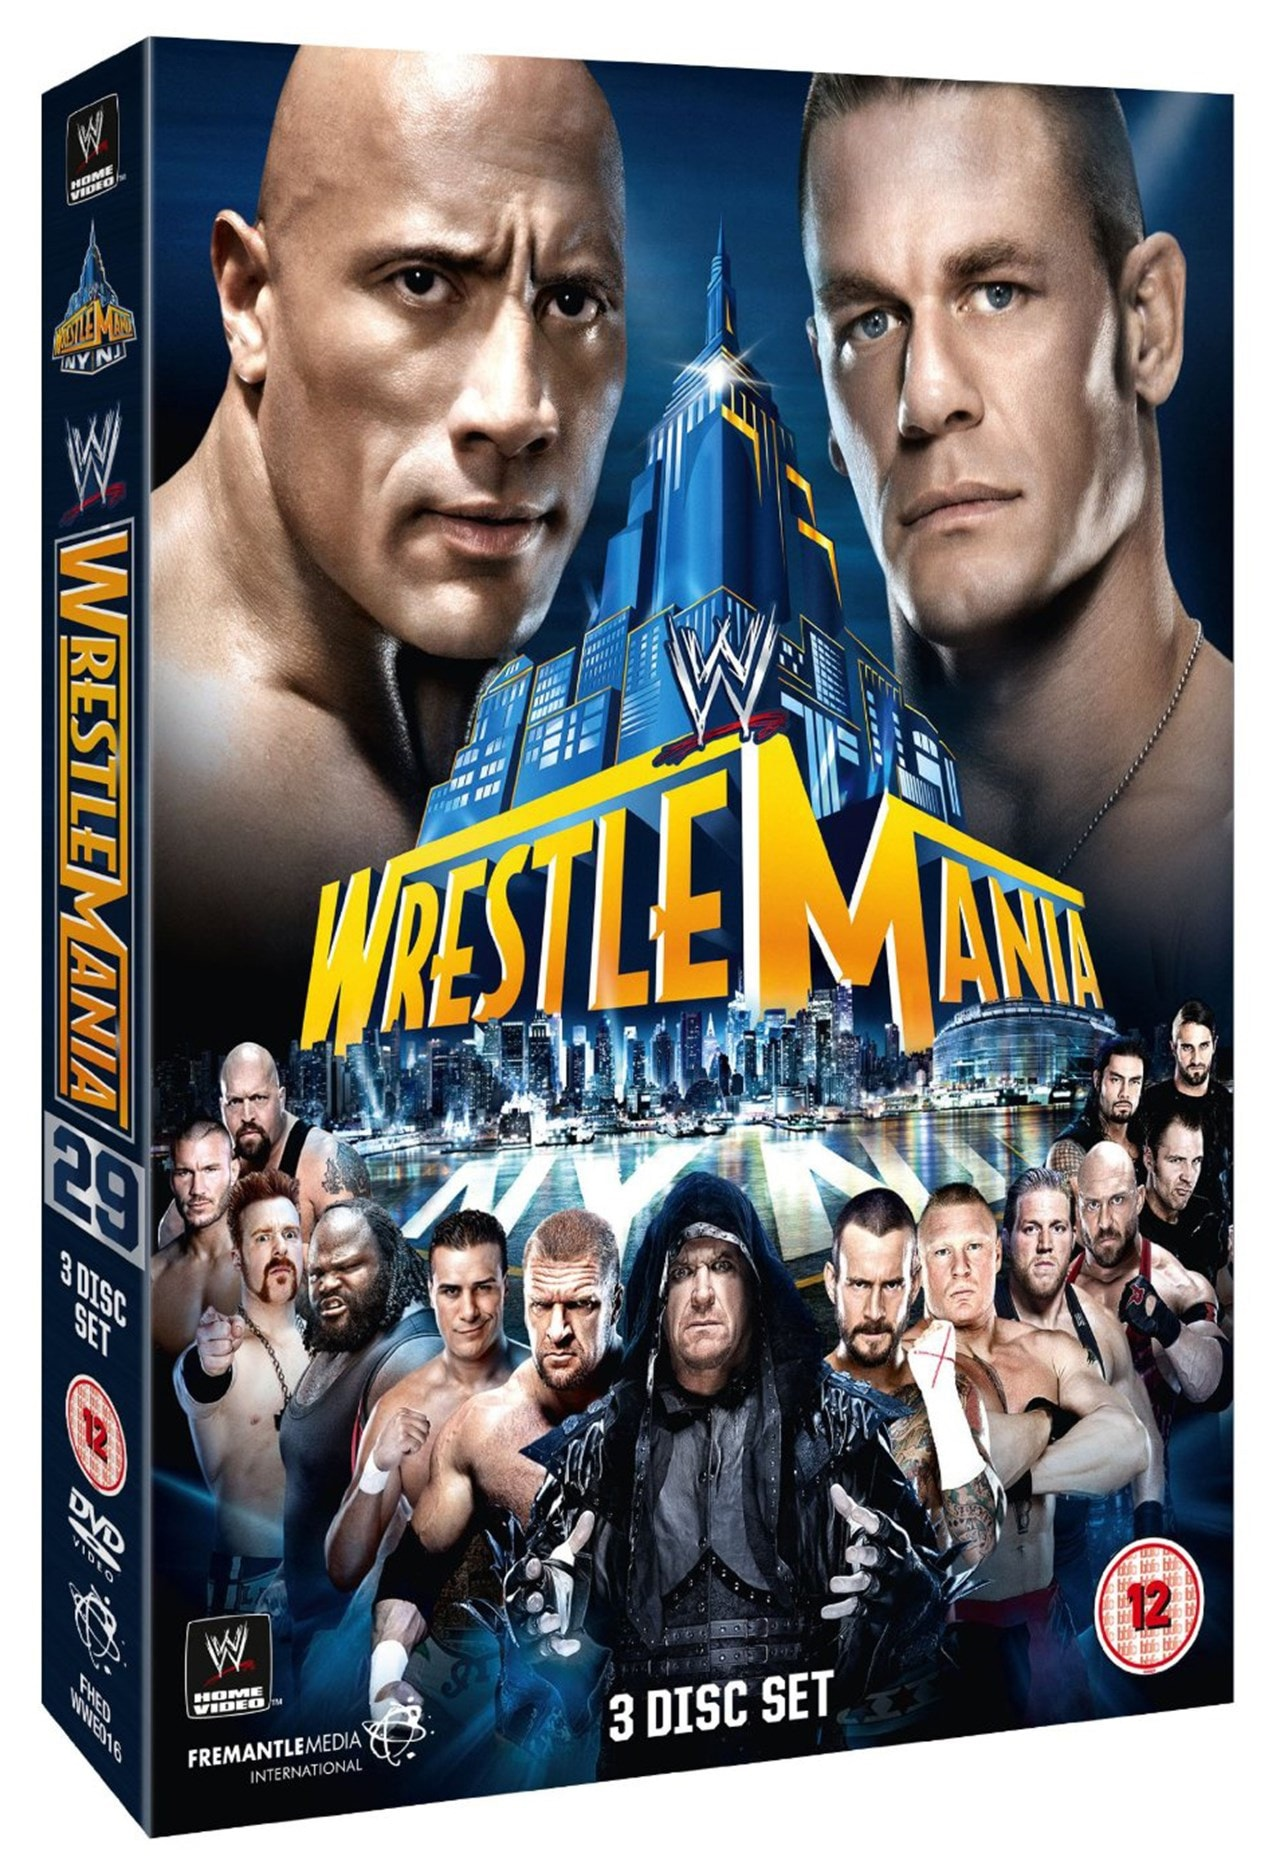 WWE: WrestleMania 29 - 2